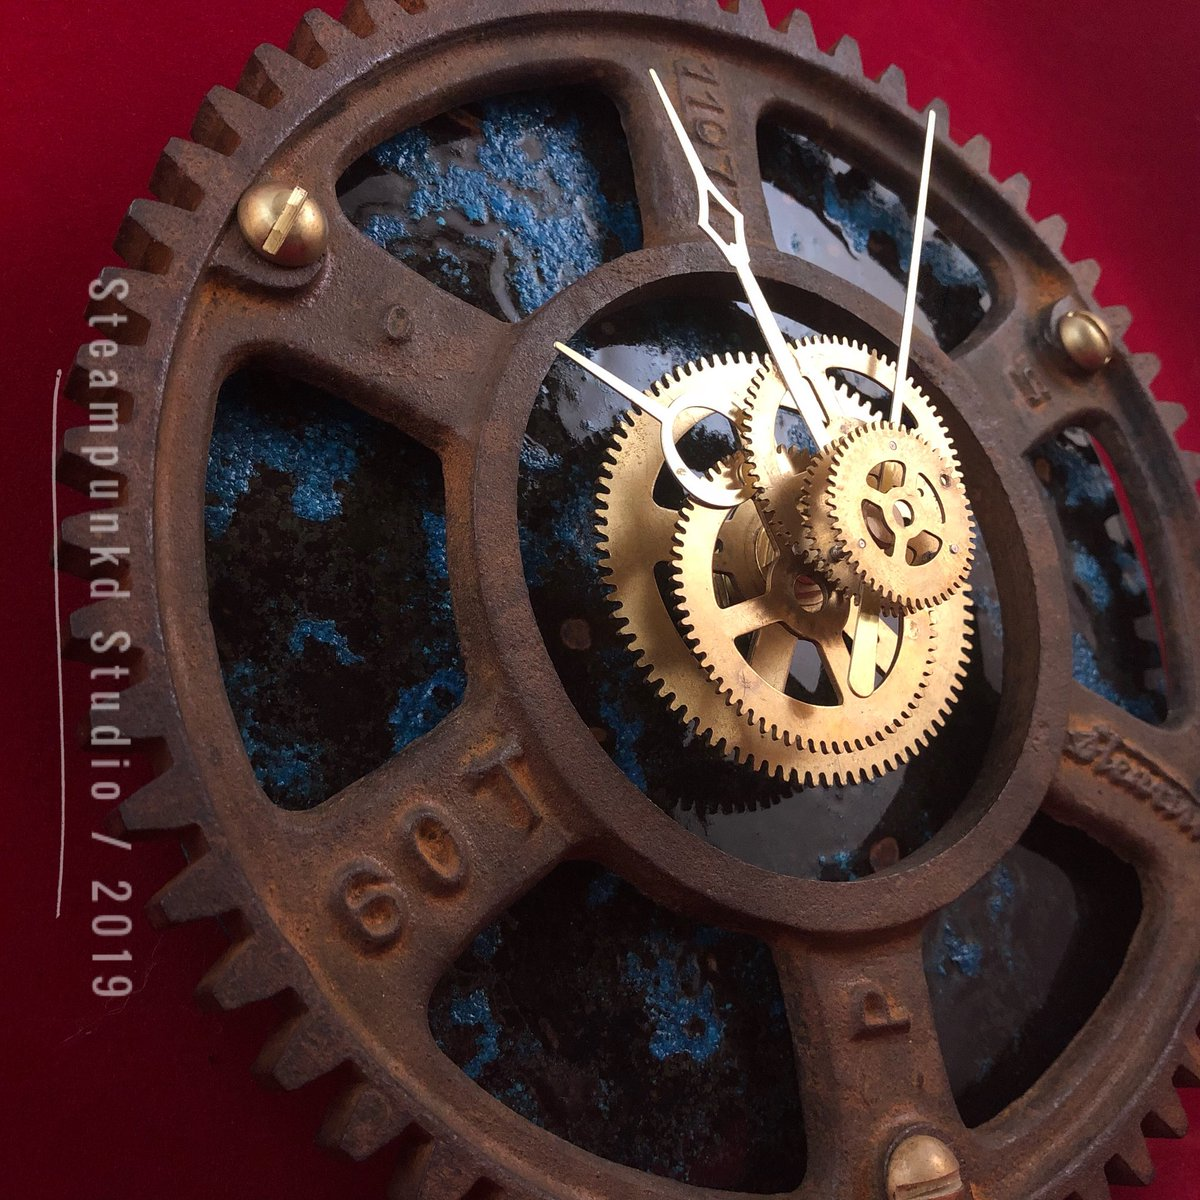 #Steampunk Clock No. 6  Ford Model T Speedometer Road Gear  https://t.co/iQ5DK6RVDv   #dieselpunk #steampunkdstudio #ford #modelT #classiccars #automotive #gearhead #postapocalyptic #art #artist #wallart #metalhead #handmade #alternative #decor #copper #clock #craftsman #vintage